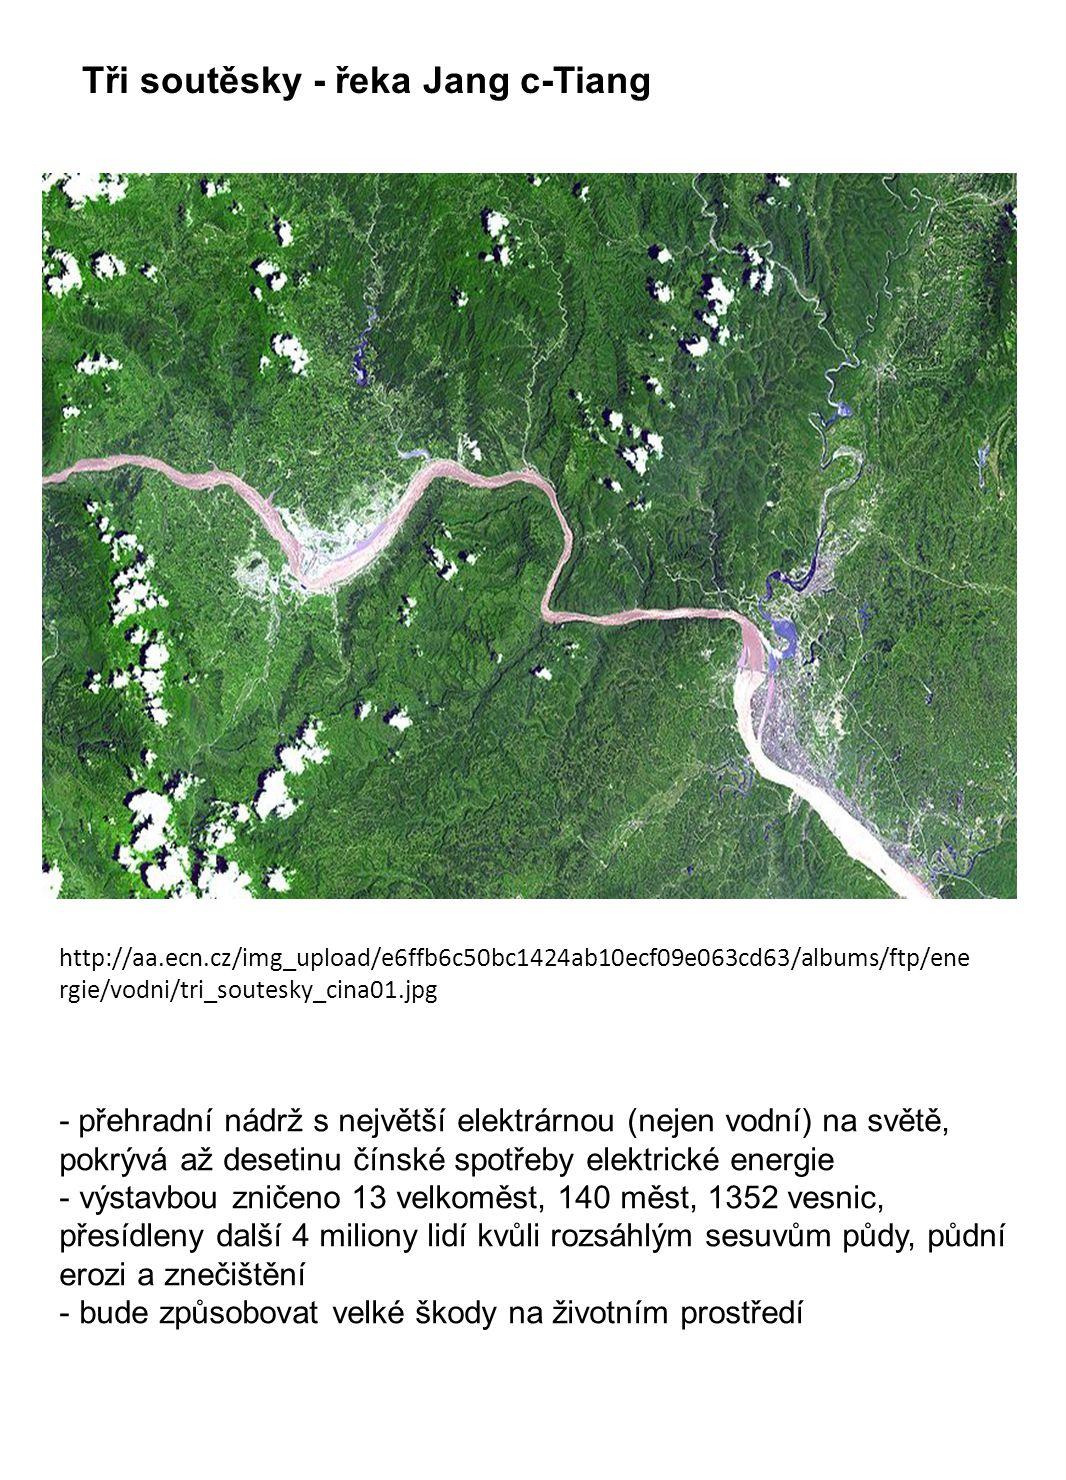 Tři soutěsky - řeka Jang c-Tiang http://aa.ecn.cz/img_upload/e6ffb6c50bc1424ab10ecf09e063cd63/albums/ftp/ene rgie/vodni/tri_soutesky_cina01.jpg - přeh